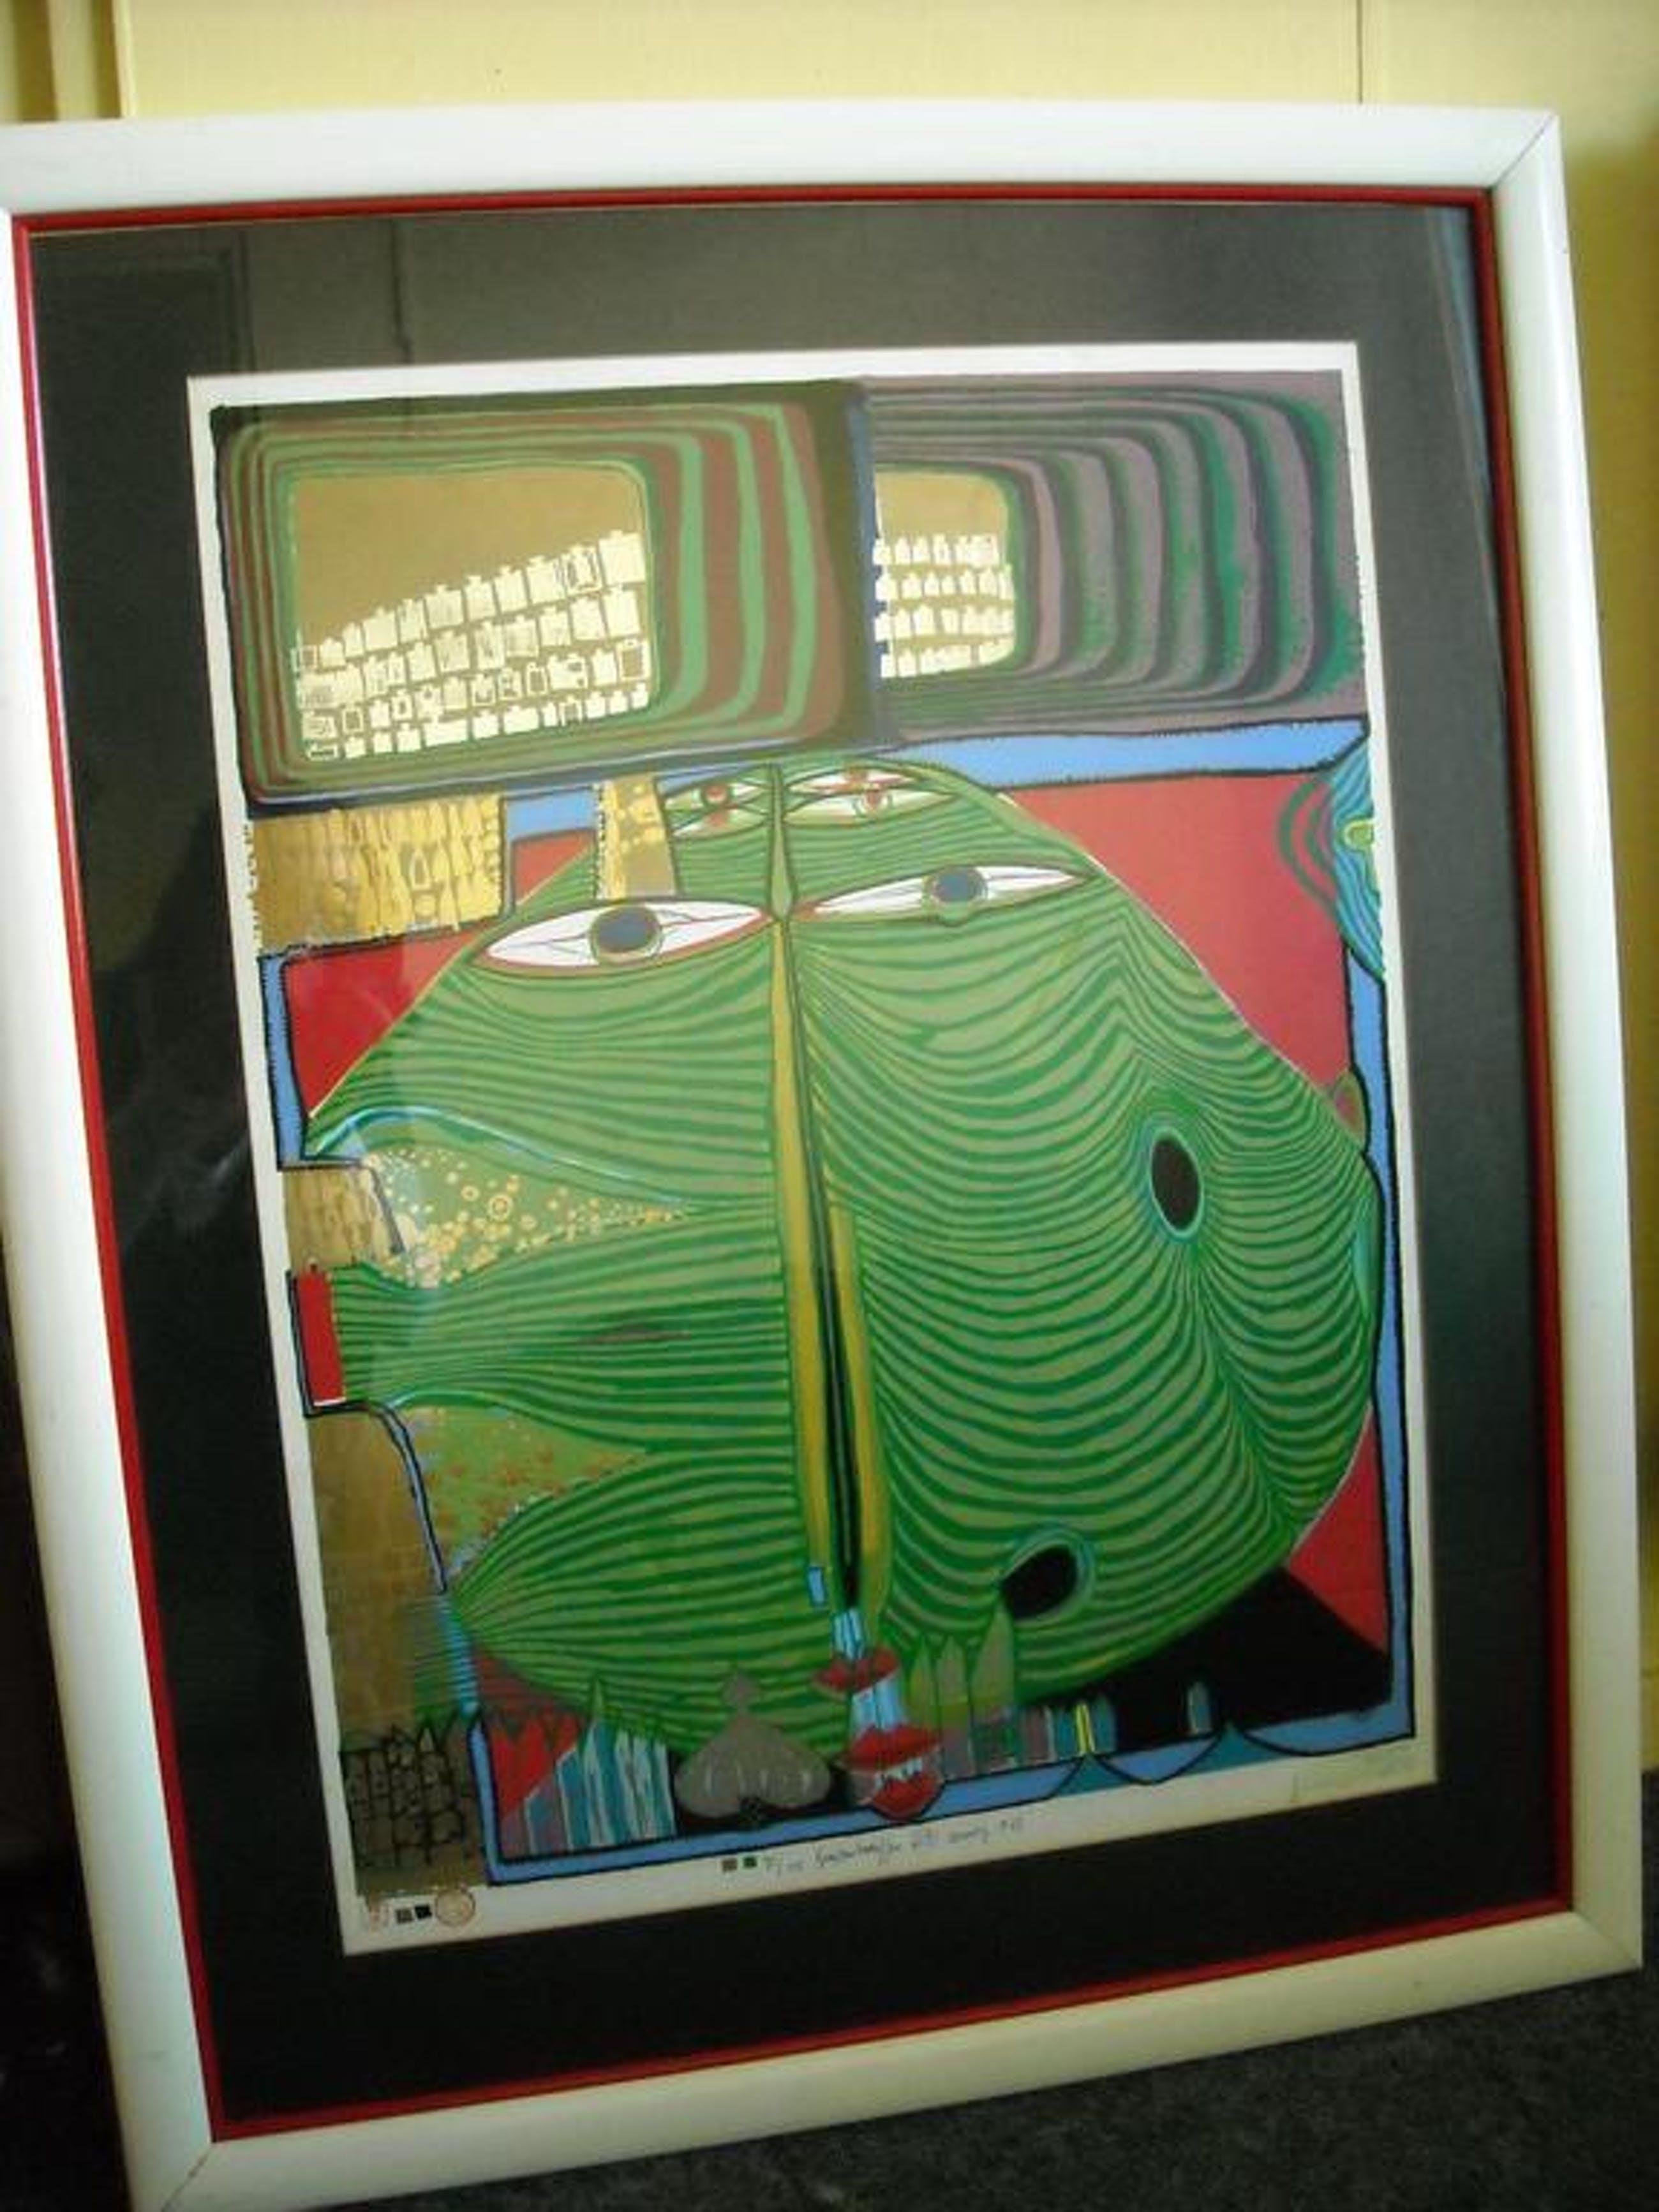 King Kong 669 druk 60 x 47 cm 1968 nr. 71/115 kopen? Bied vanaf 1500!